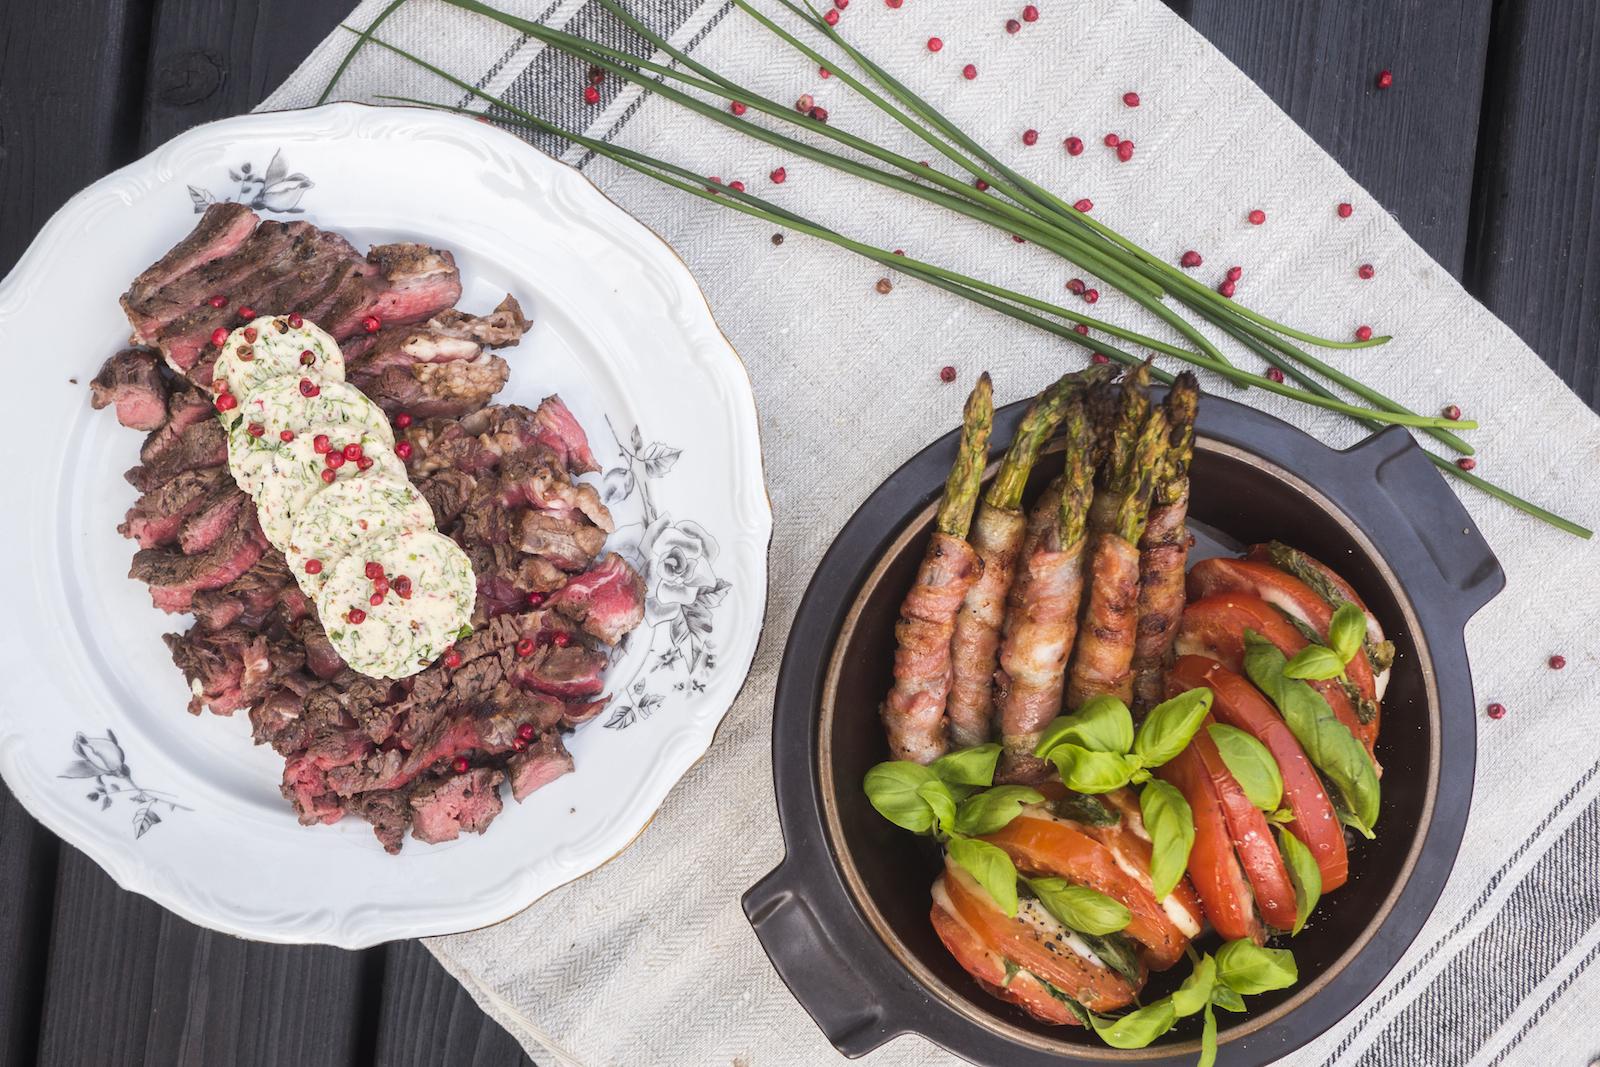 rib_eye_steak_pihvit_grillissa_b